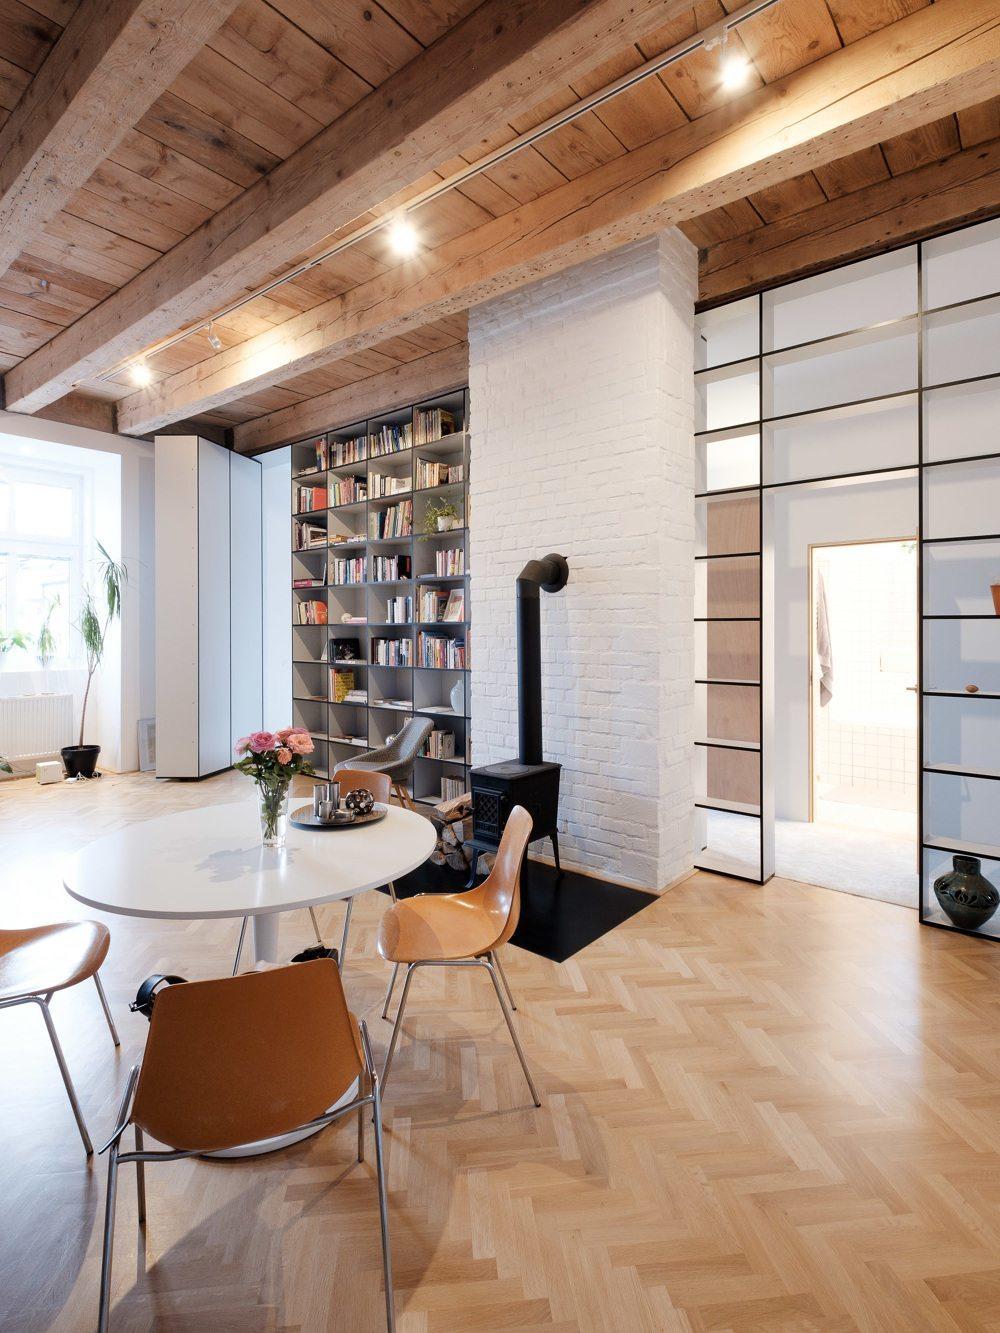 visgraat-vloer-houten-plafond